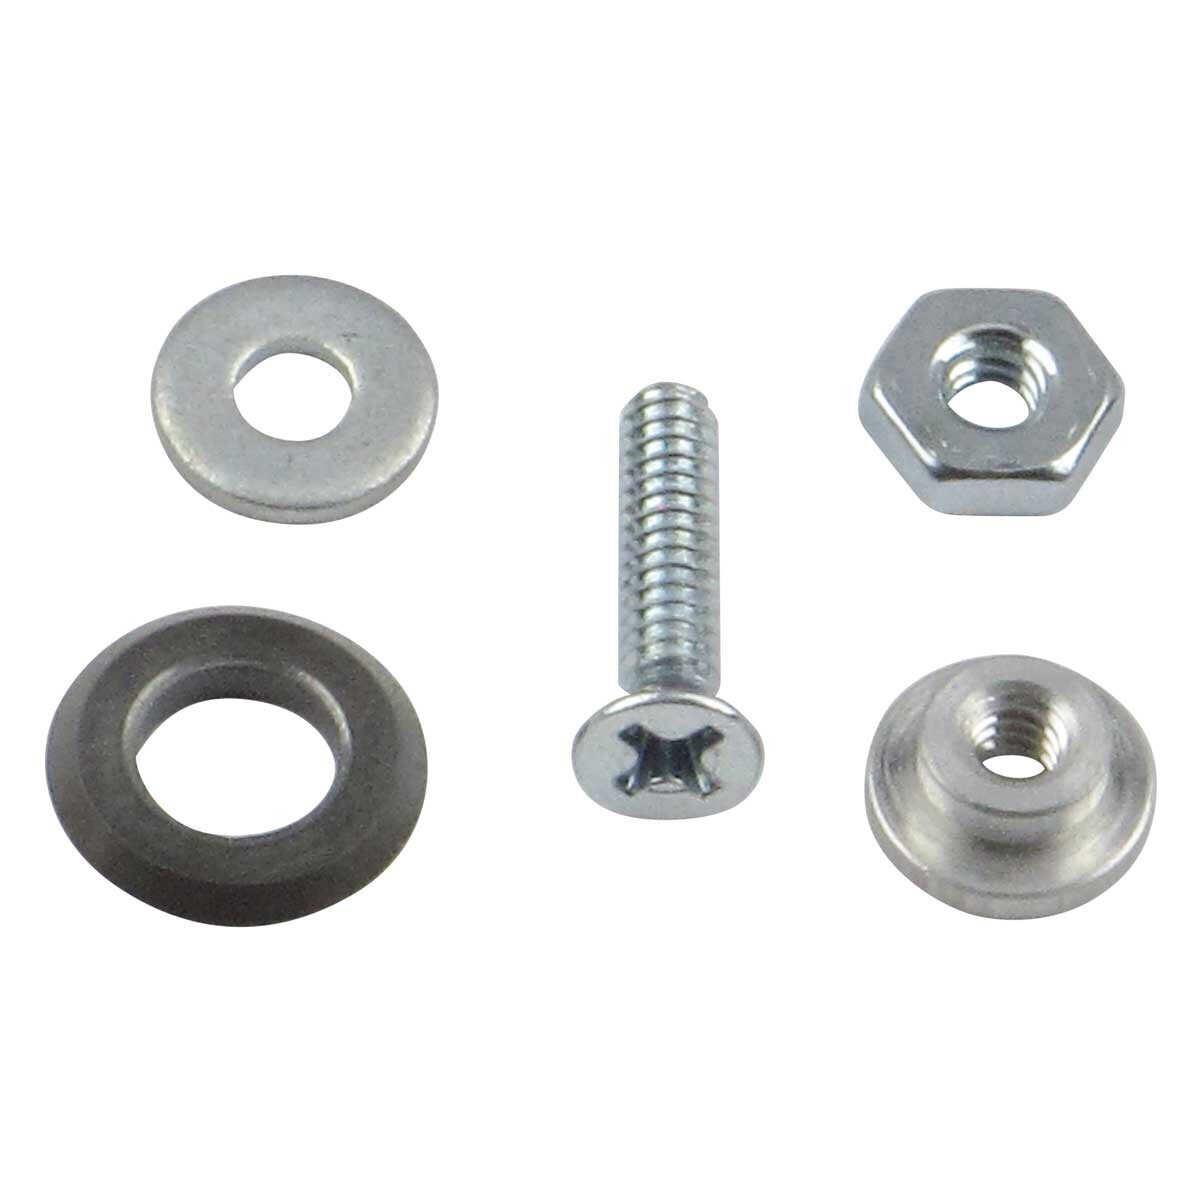 superior scoring wheel components